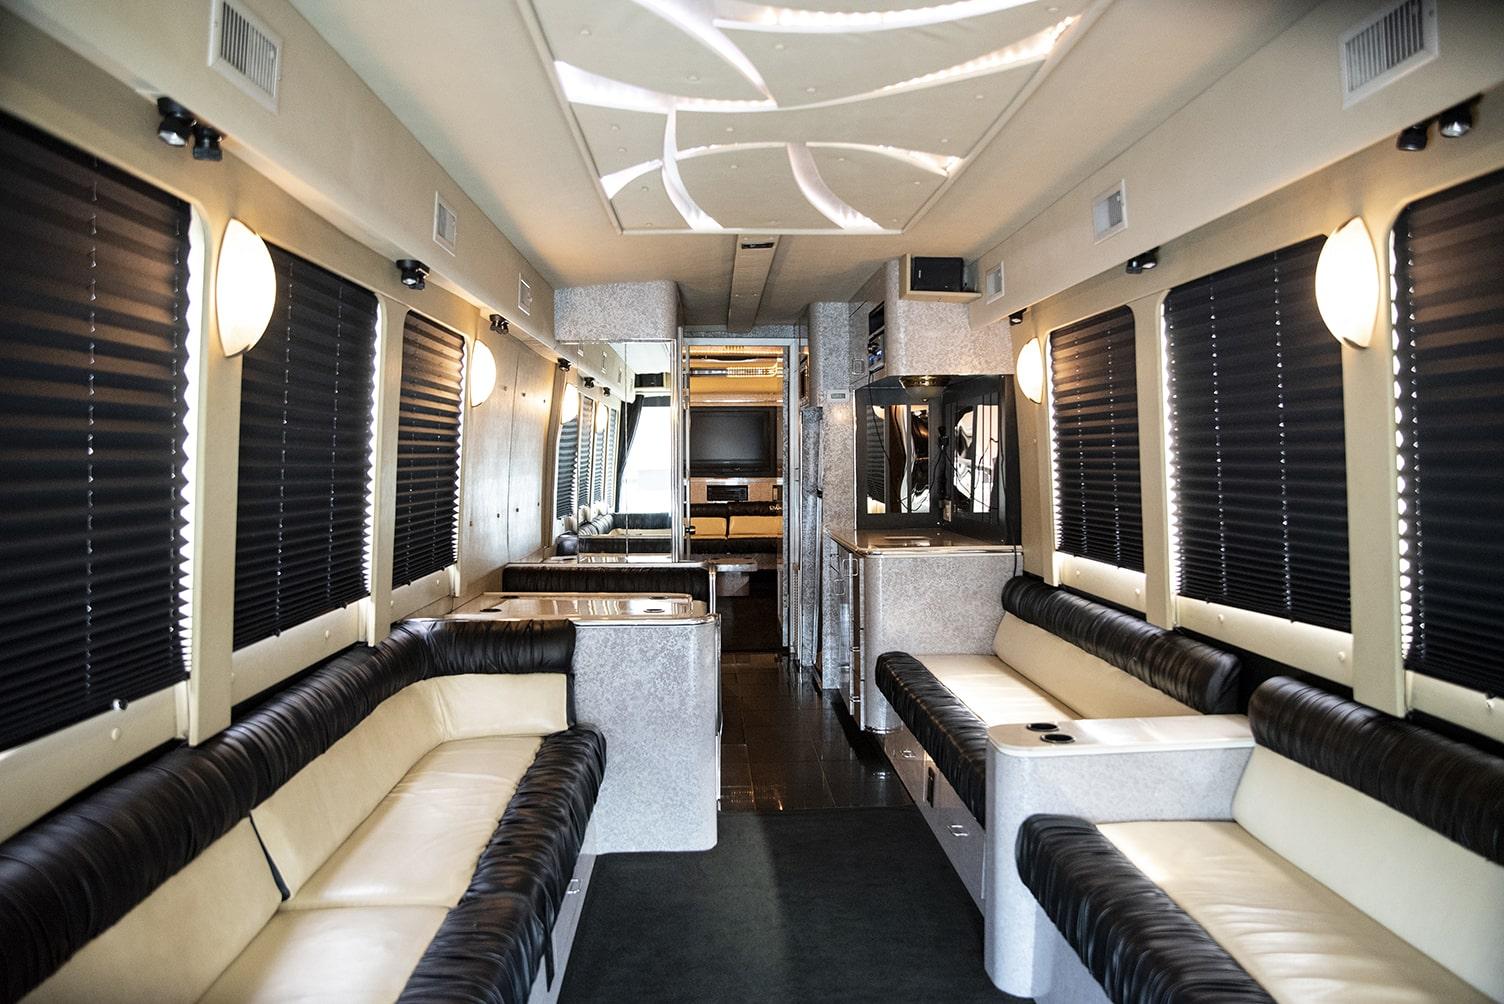 NL Wedding Transportation, Luxury Party Bus, St. John's Coach Bus, Bridal Party Transportation, NL bus rental